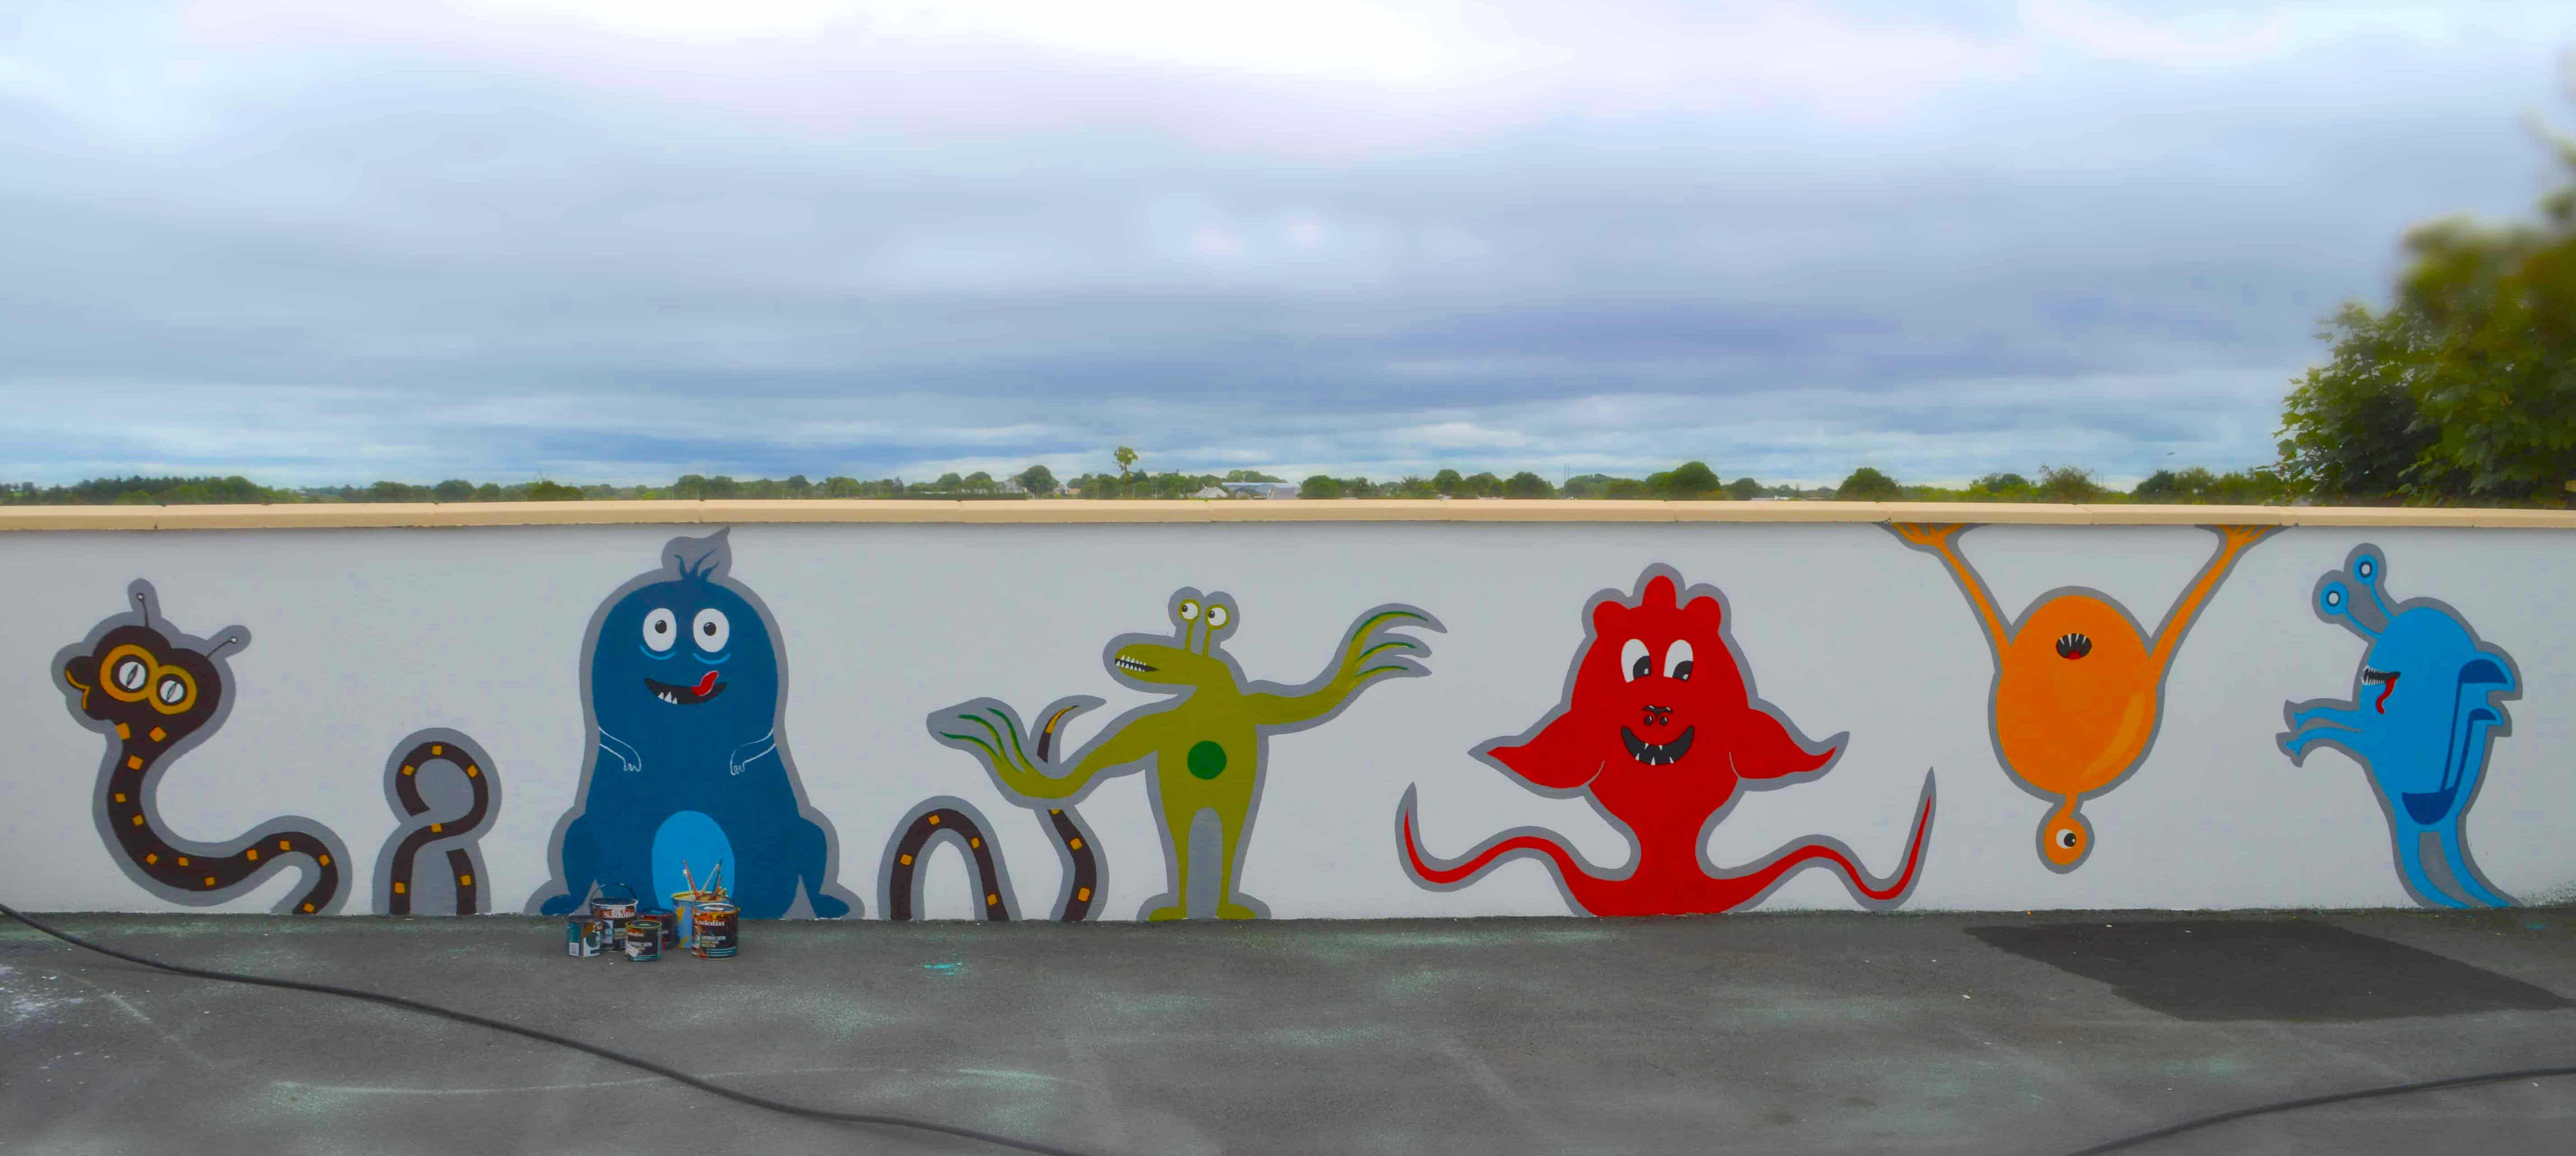 Artistic Mural at Play-school Mayo